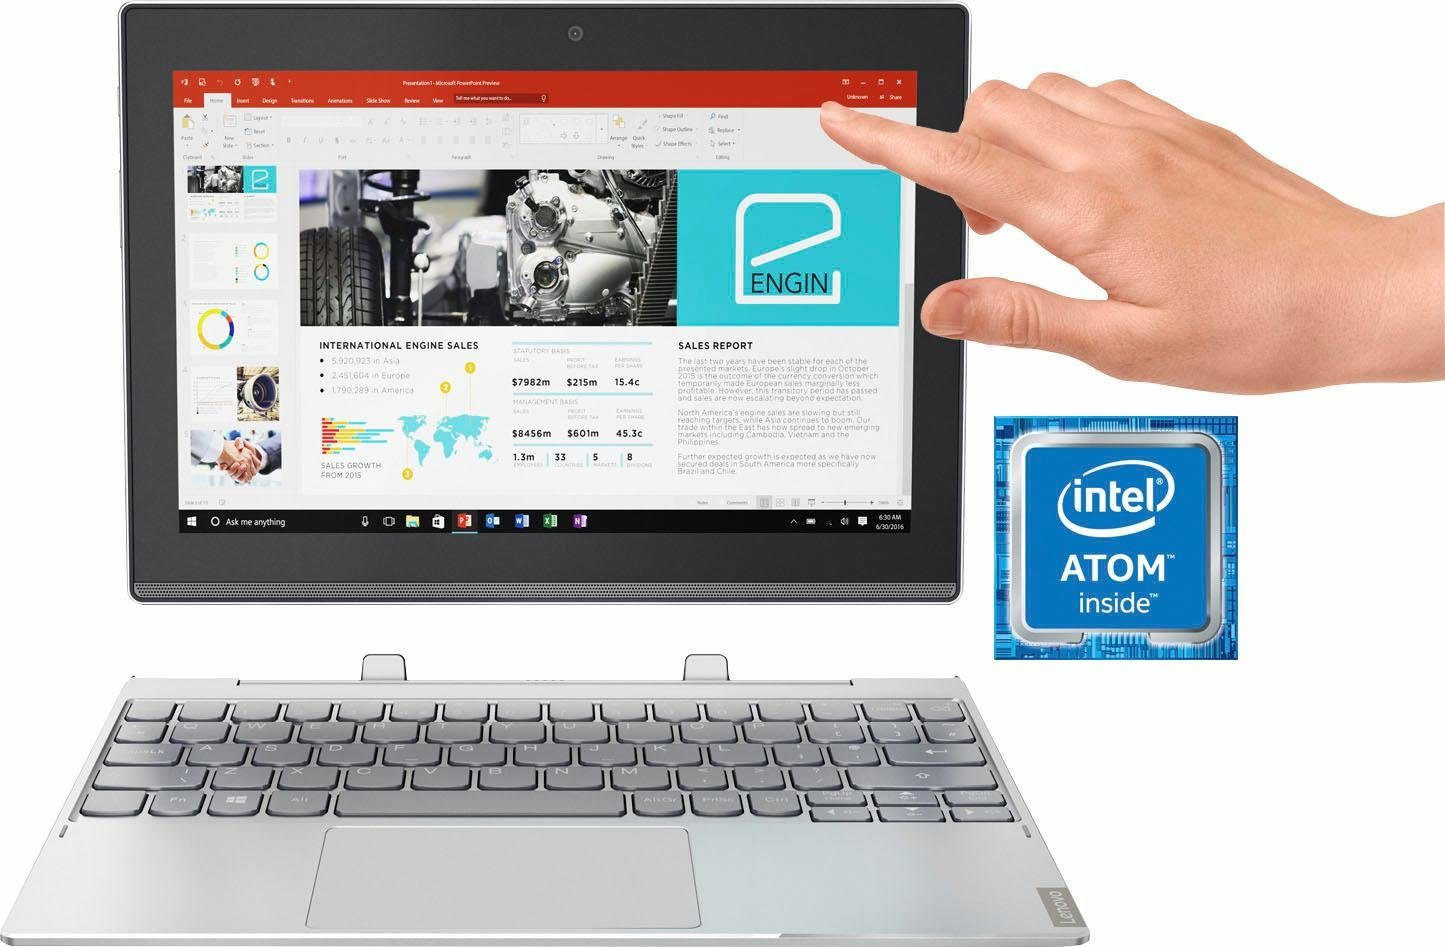 Lenovo MIIX 320-10ICR Convertible Notebook (25,7 cm/10,1 Zoll, Intel Atom, HD Graphics)